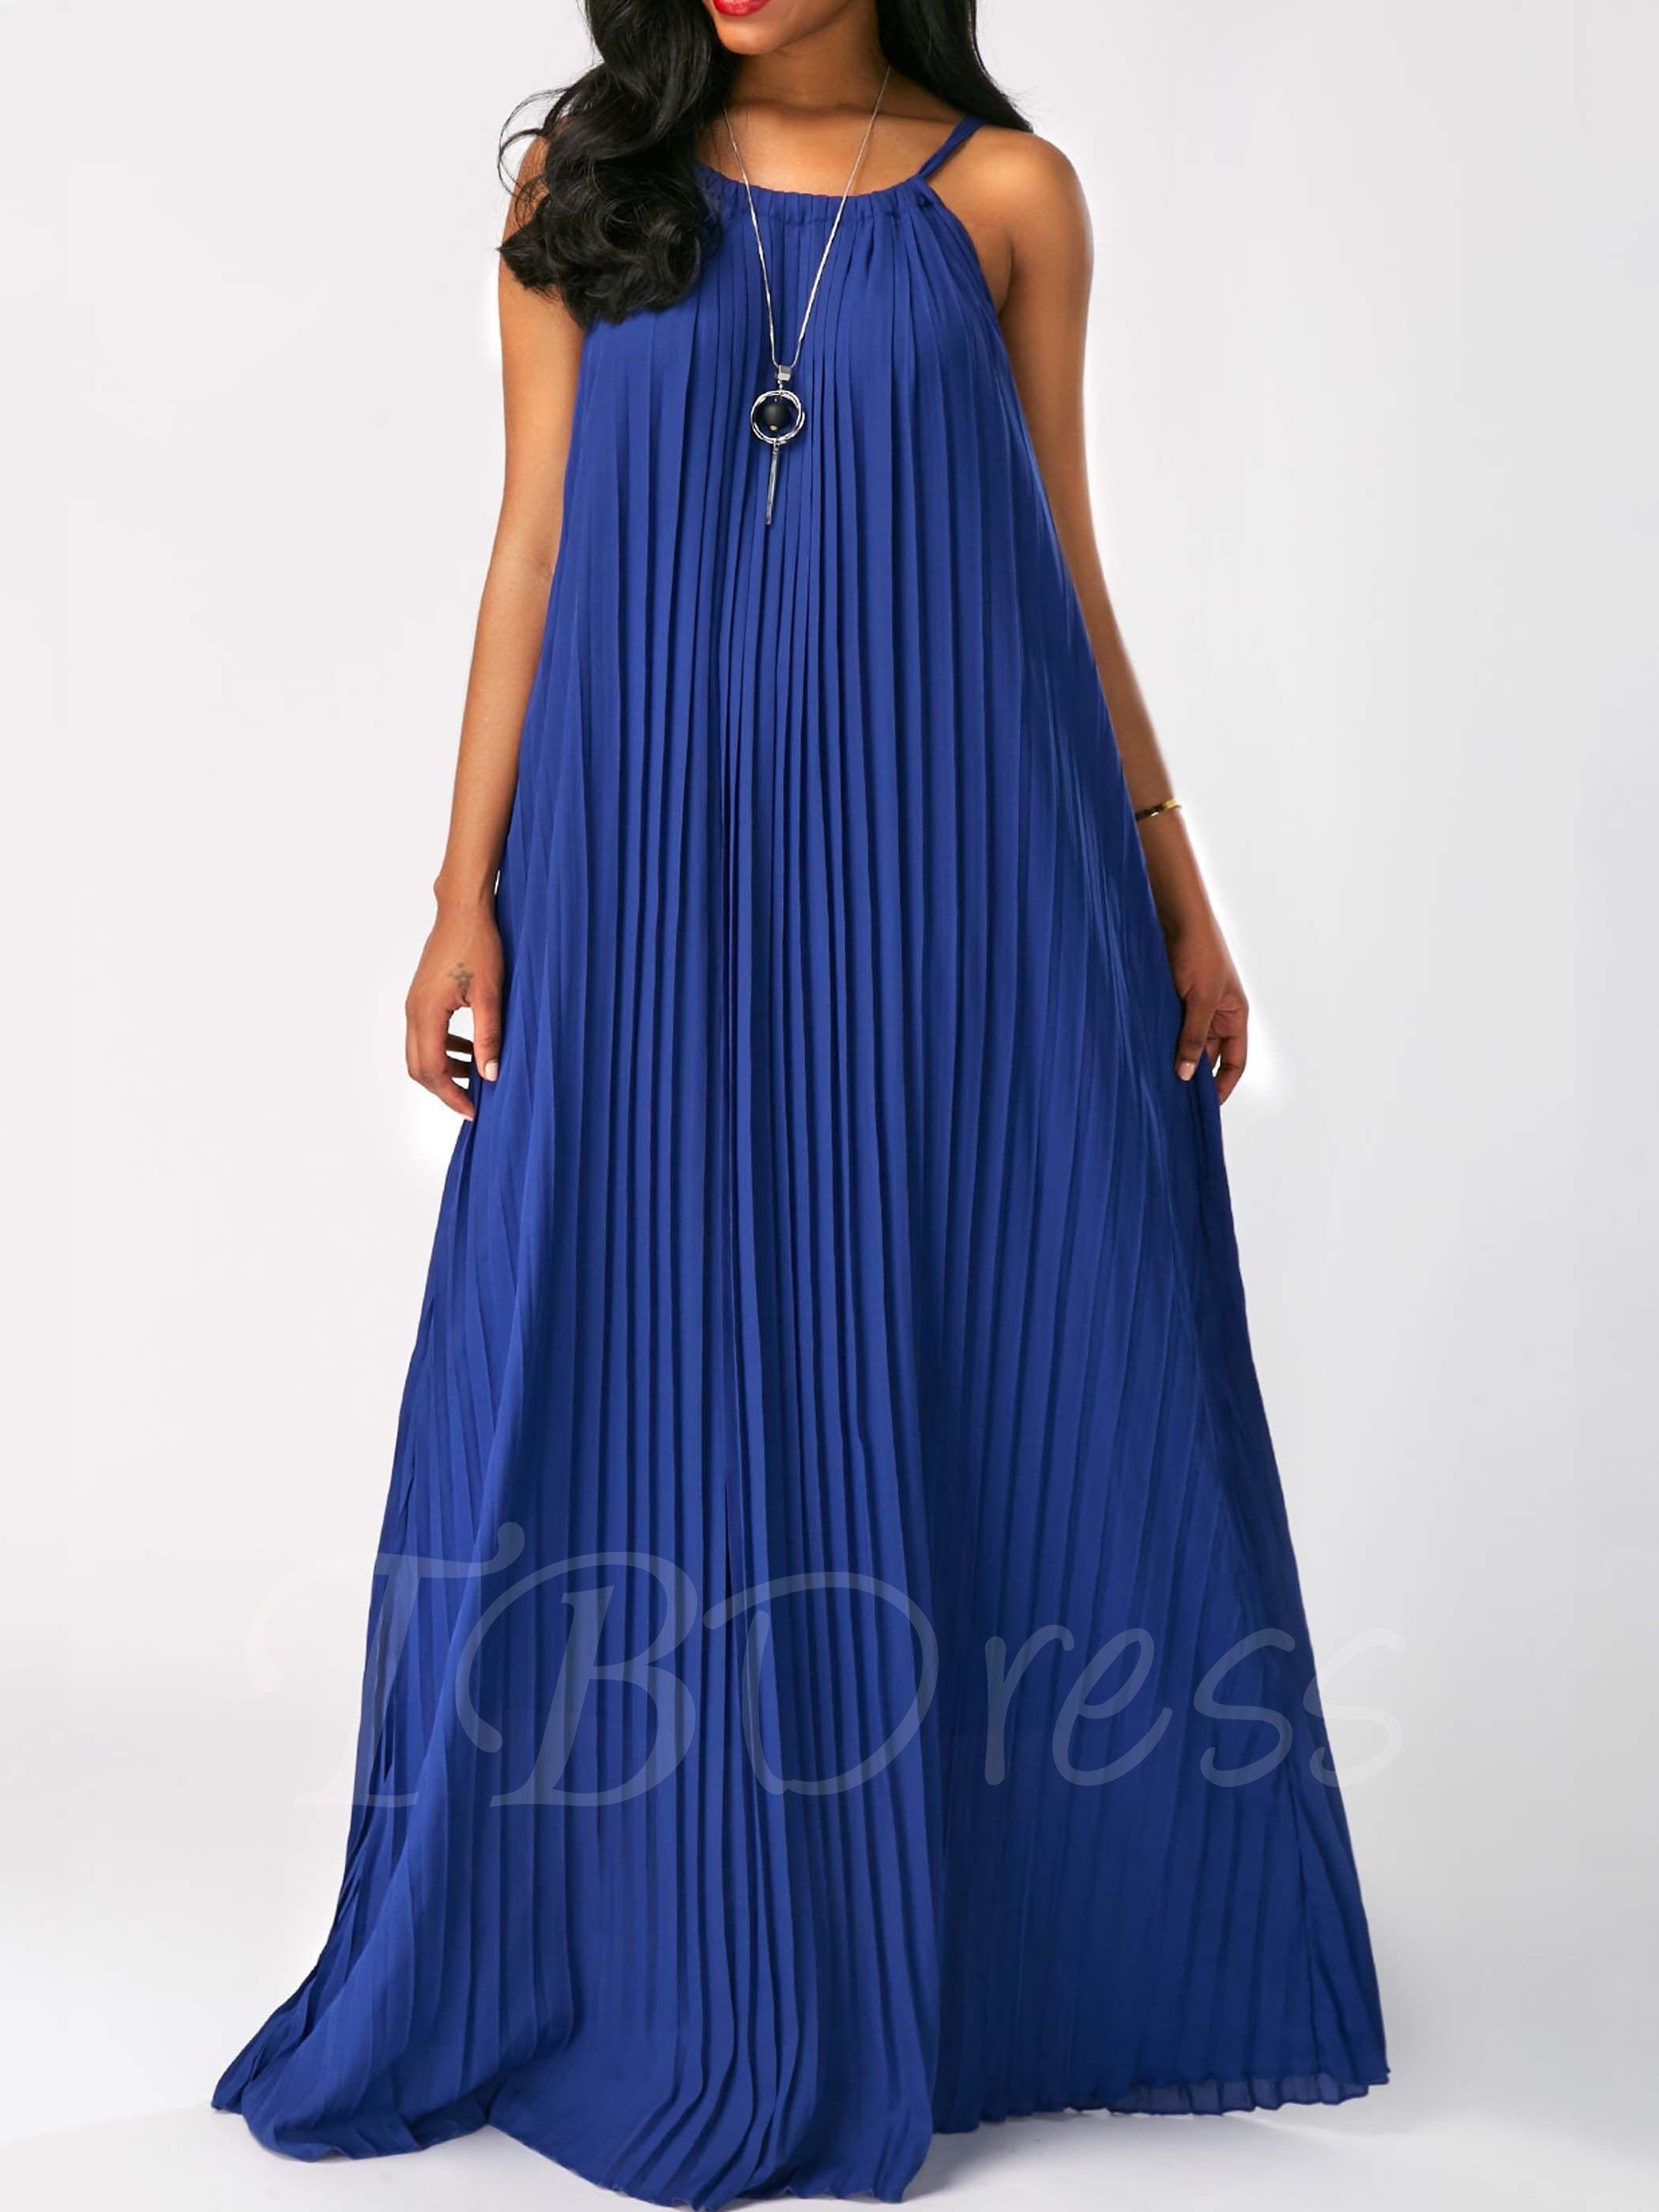 Royal Strappy Pleated Women S Maxi Dress Maxi Dress Royal Blue Maxi Dress Shop Casual Dresses [ 2800 x 2100 Pixel ]